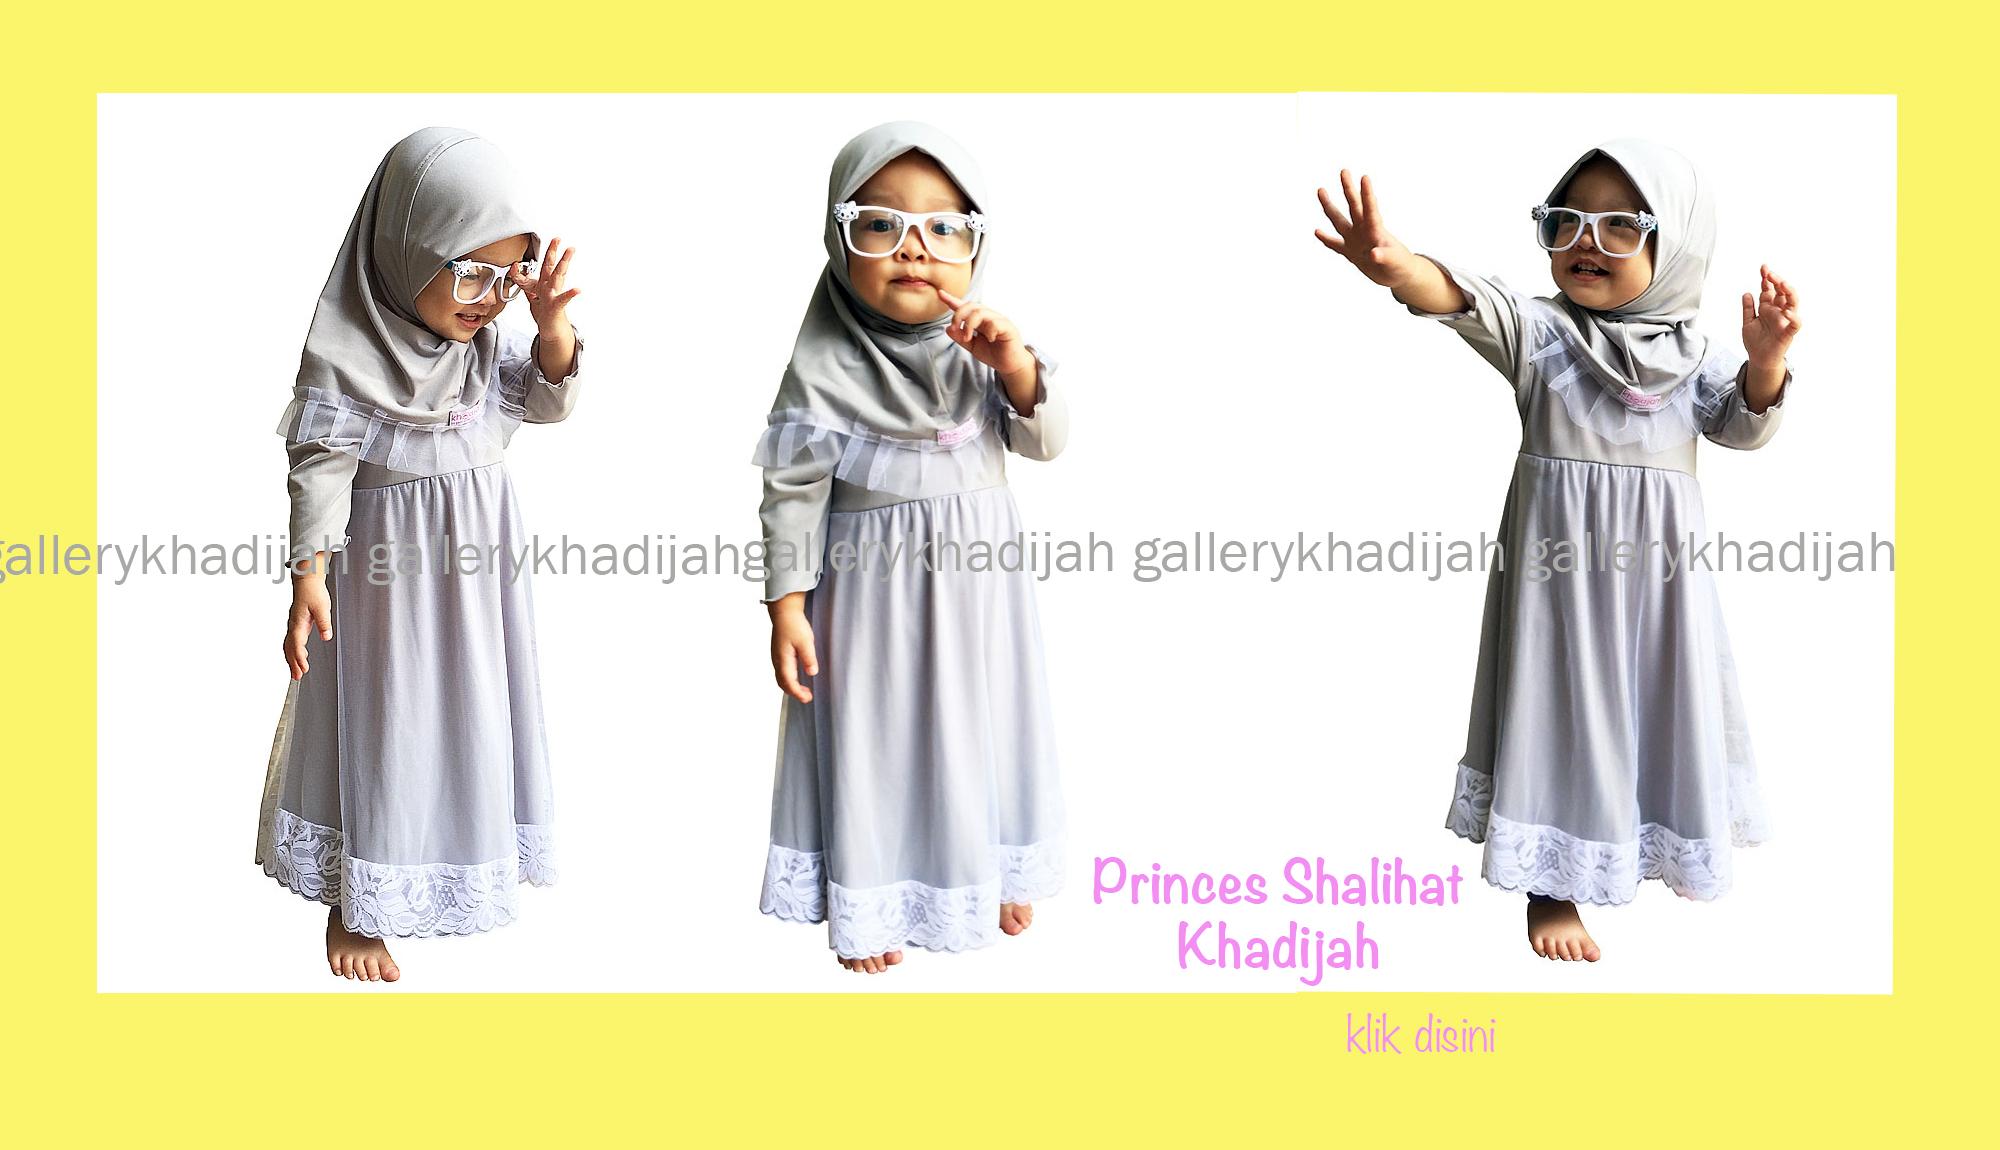 koleksi abaya khadijah